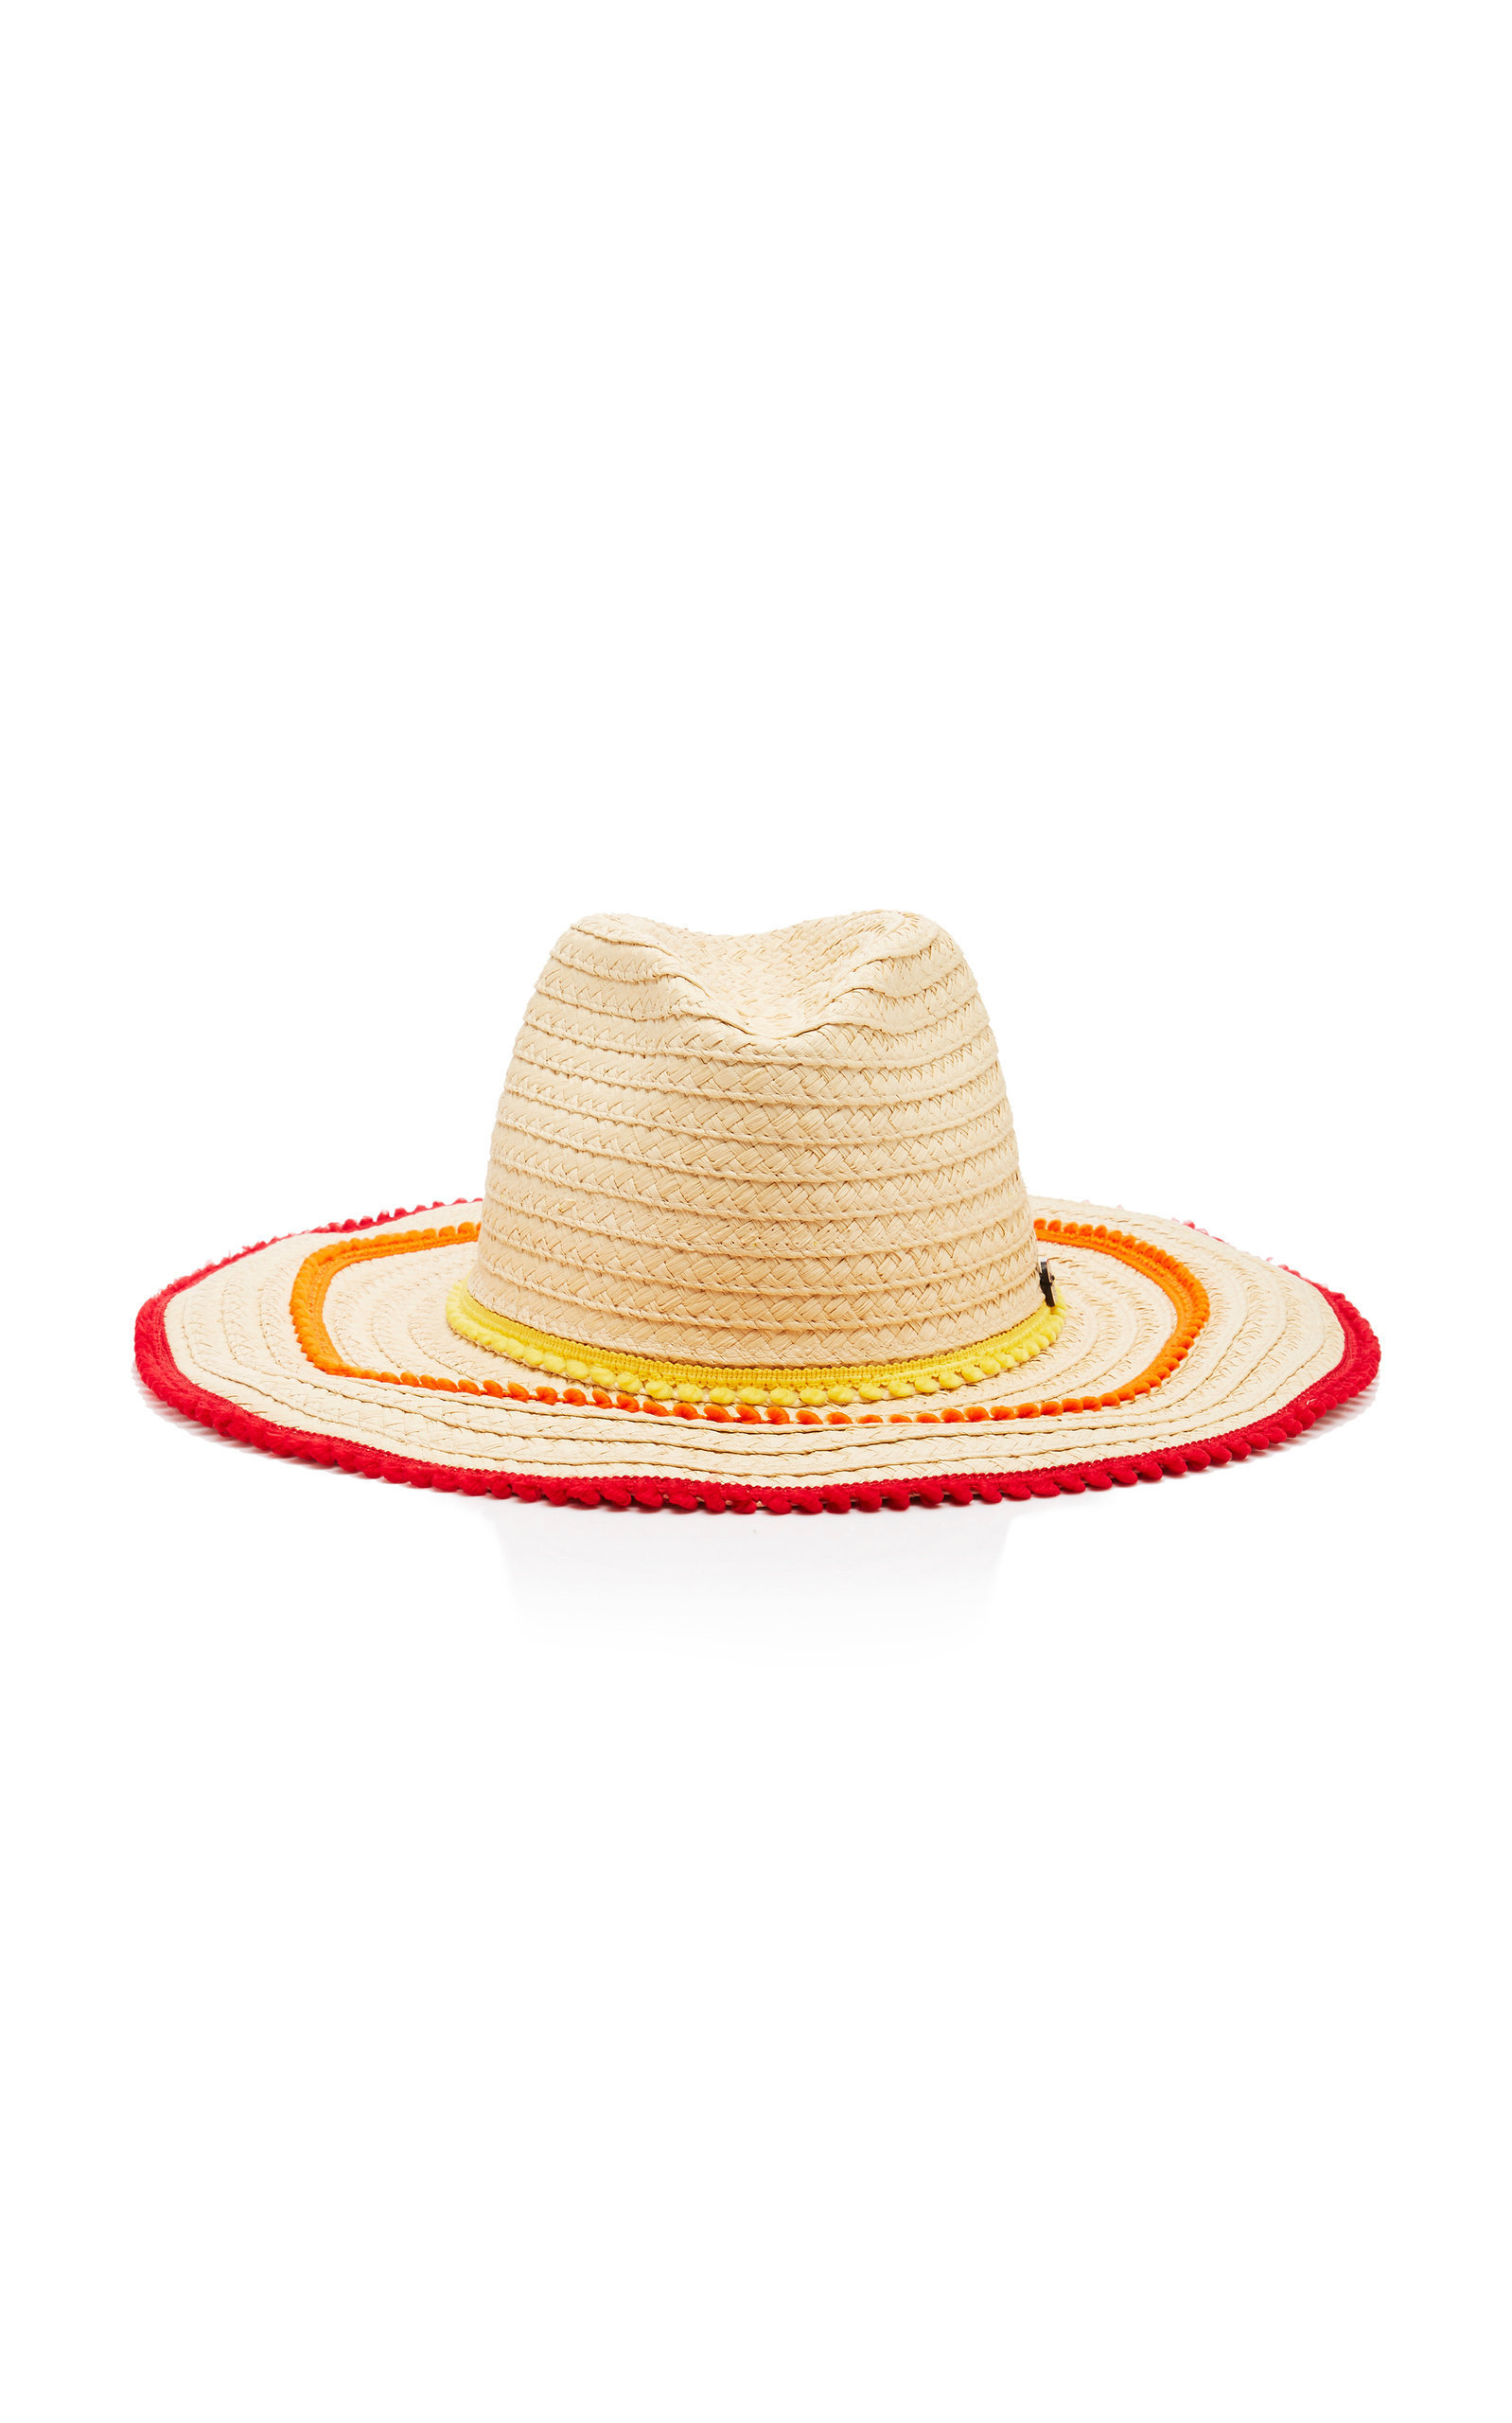 6c022f36 FilÙ Hats Batu Tara Picot-Trimmed Straw Hat In Multi